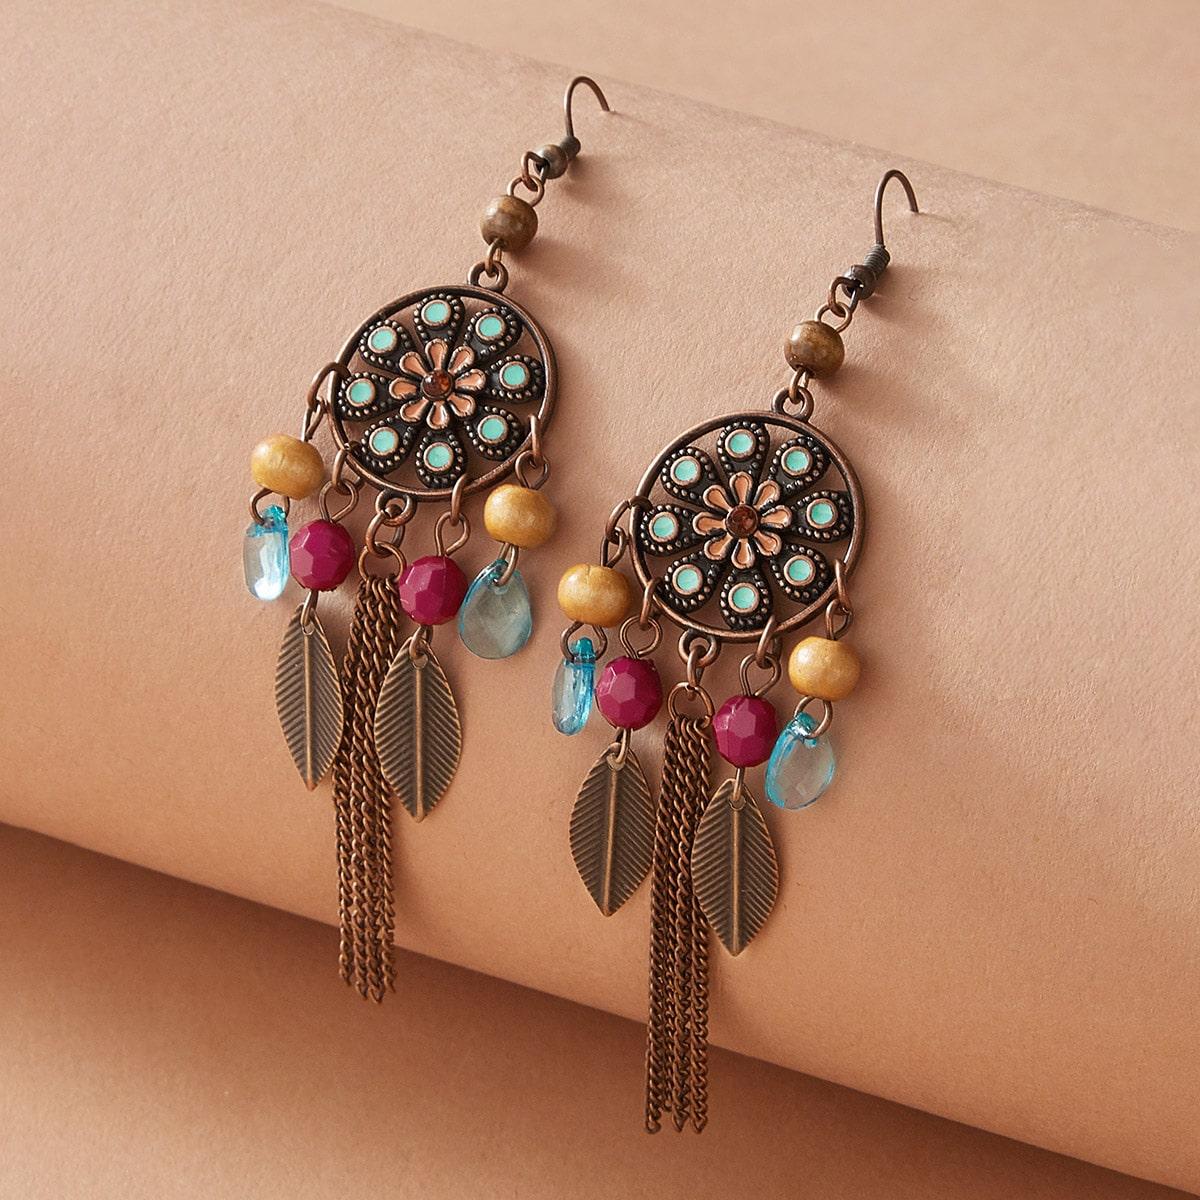 1 Paare Feather & Chain Tassel Drop Ohrringe